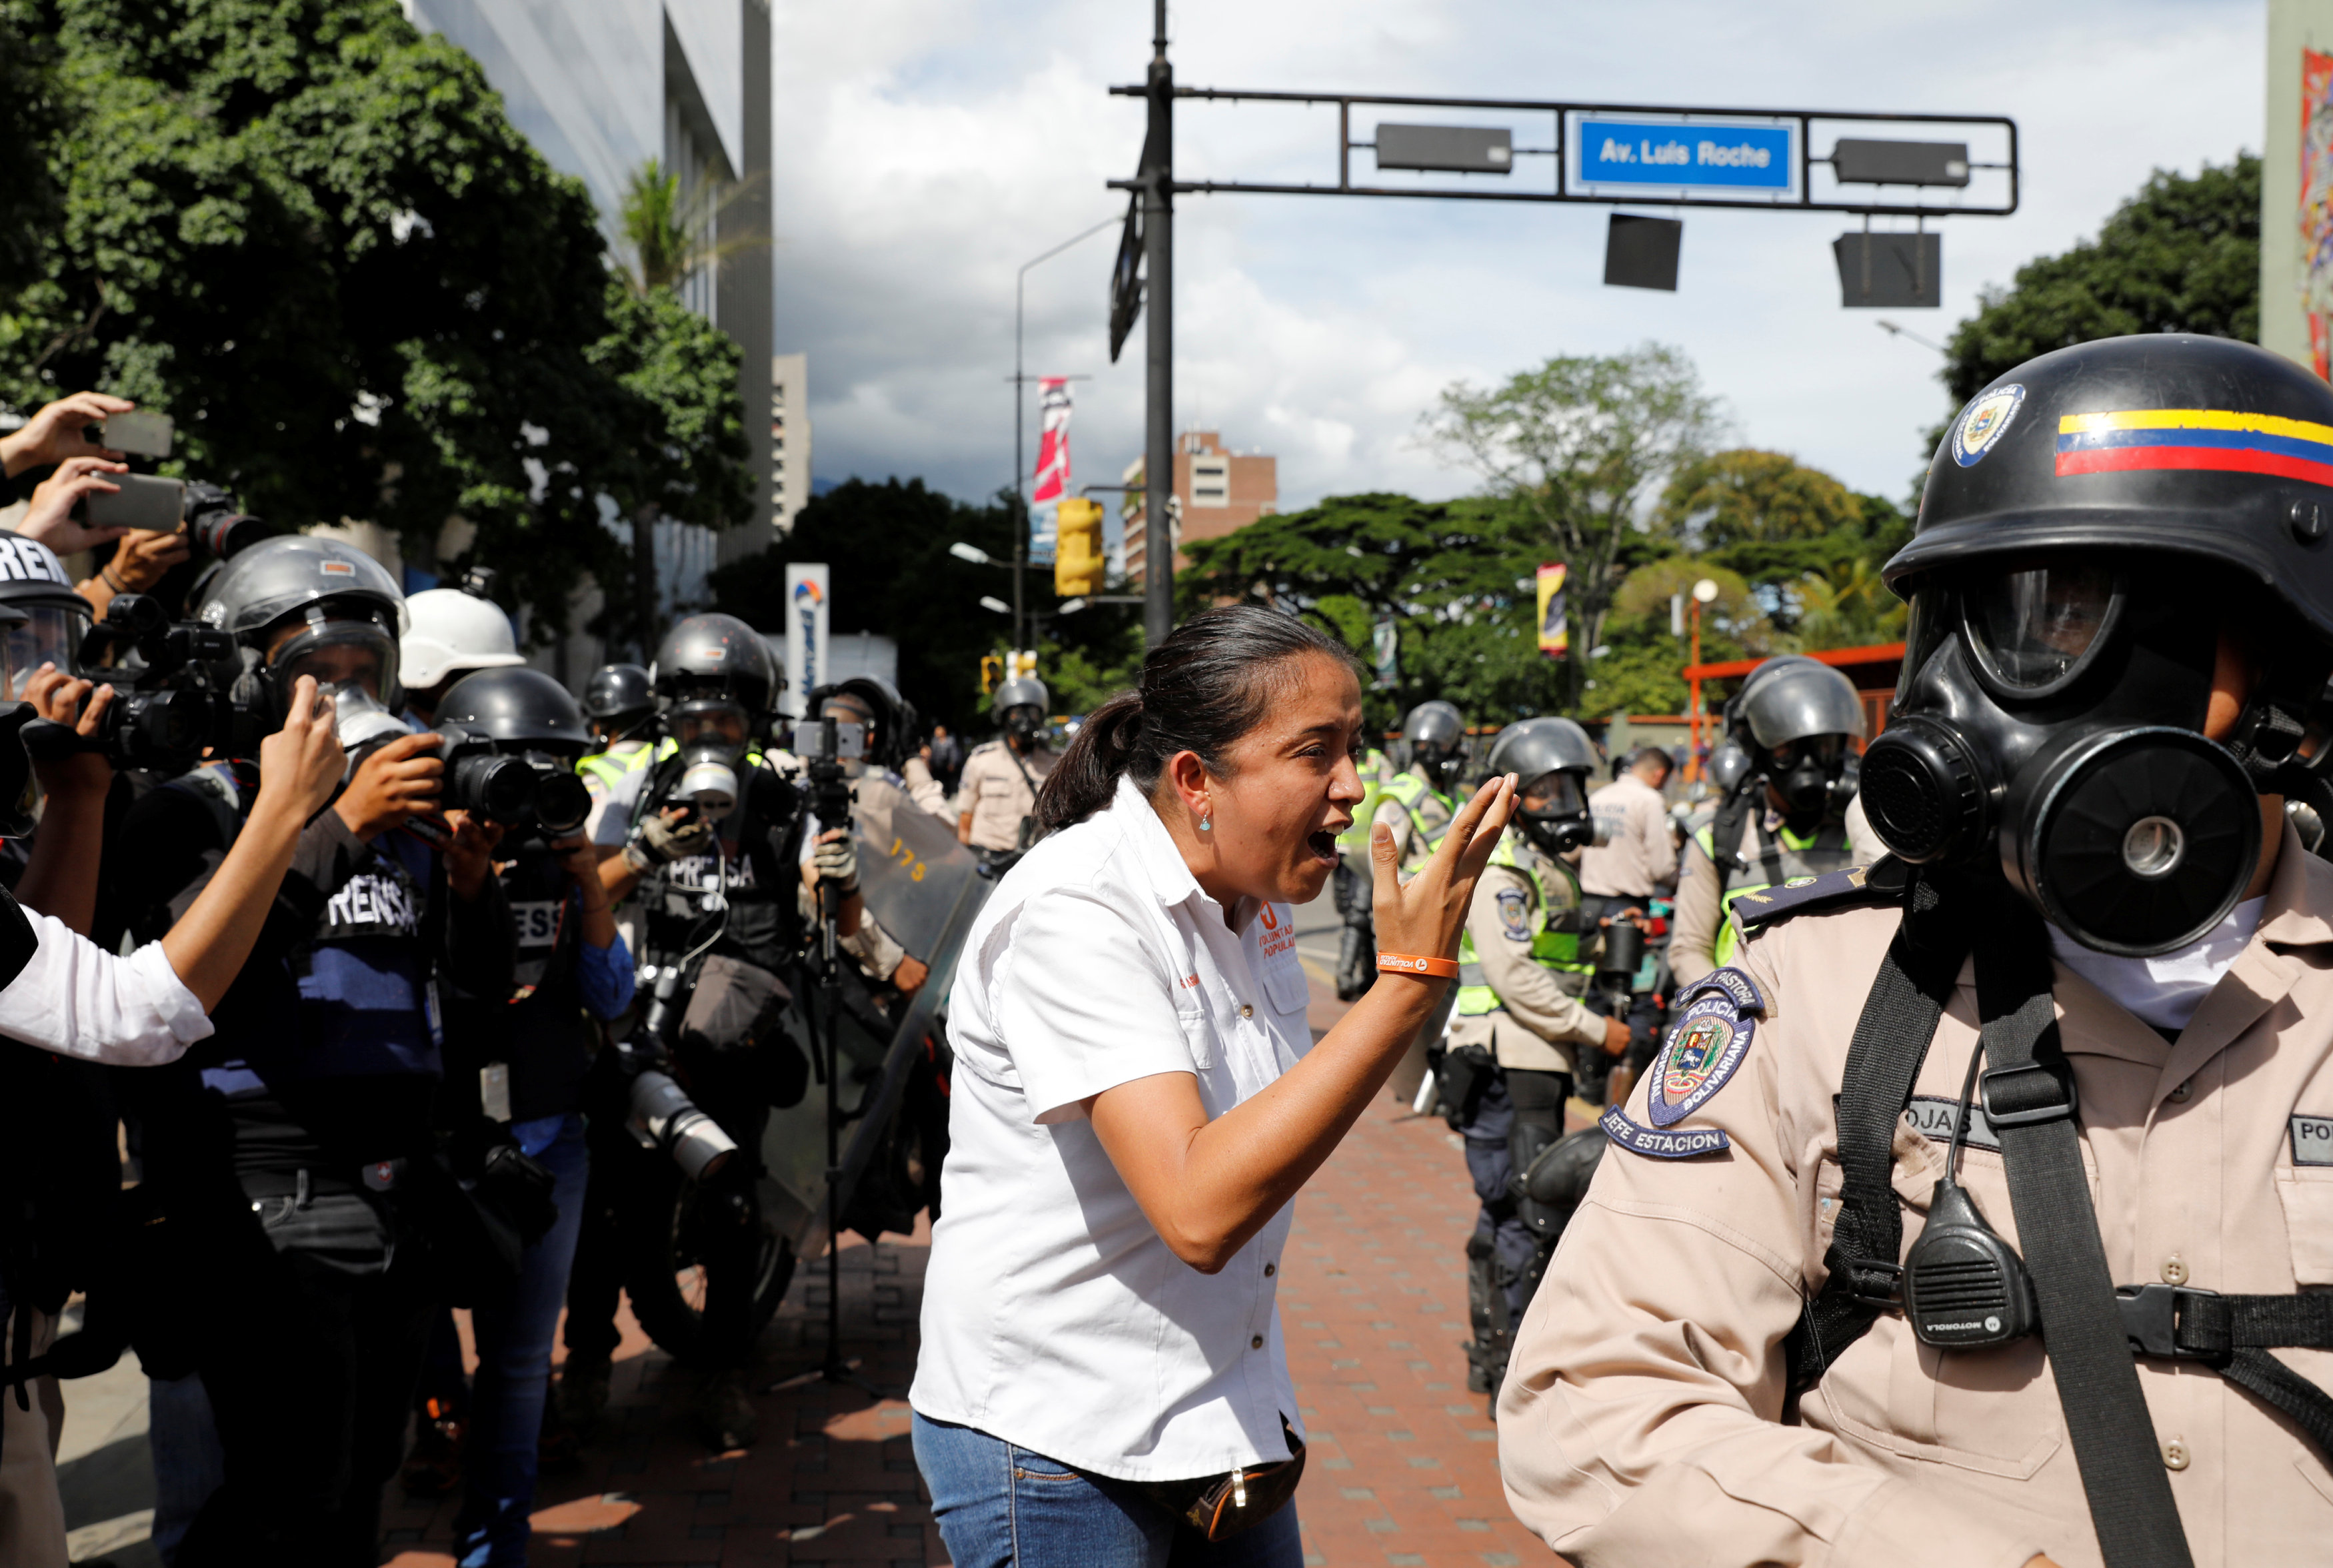 Gaby Arellano (C), lawmaker of the Venezuelan coalition of opposition parties (MUD) gestures toward security forces during a rally against Venezuela's President Nicolas Maduro's government in Caracas, Venezuela June 14, 2017.  REUTERS/Carlos Garcia Rawlins